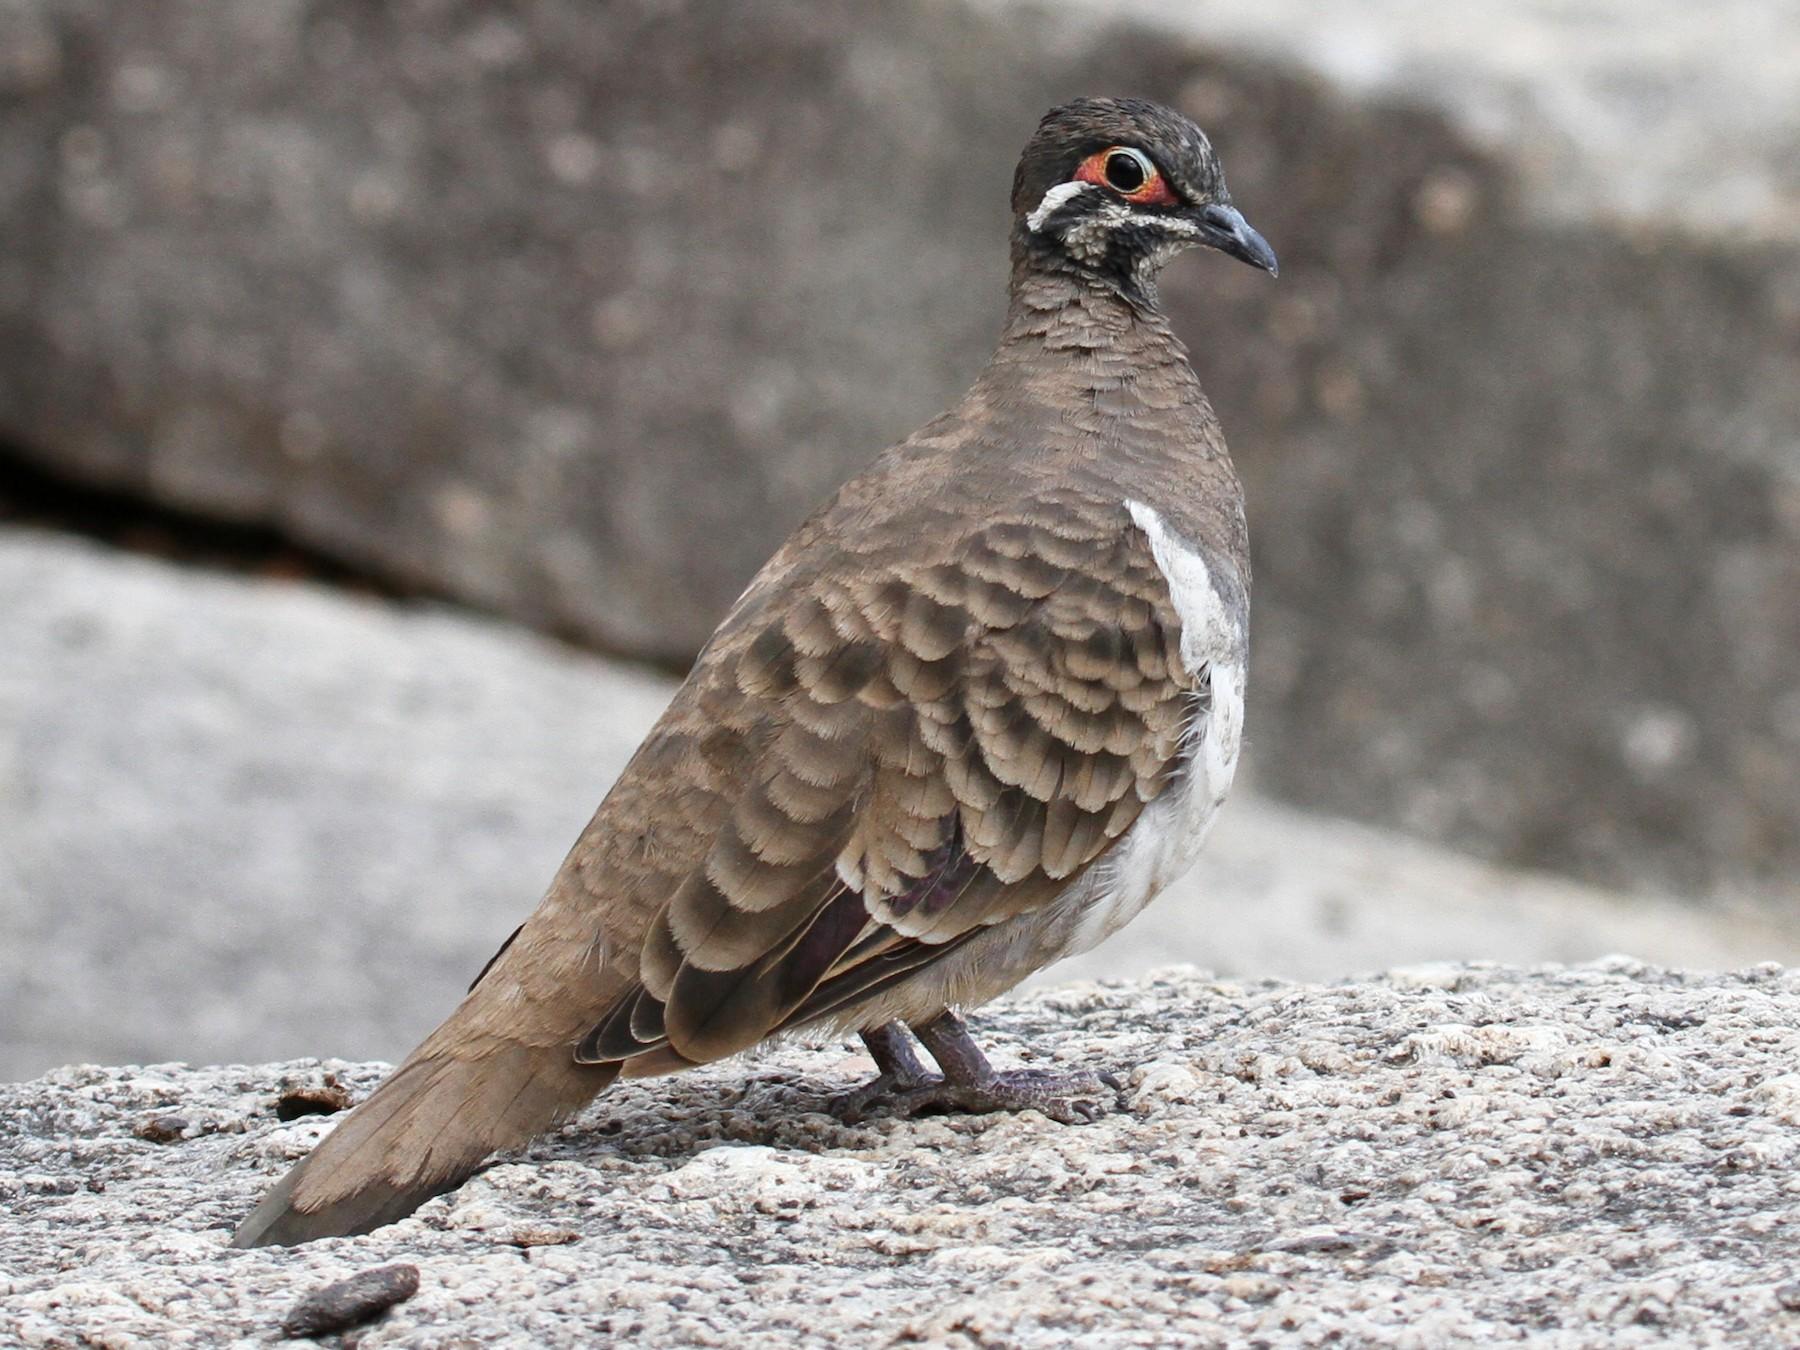 Squatter Pigeon - Margot Oorebeek